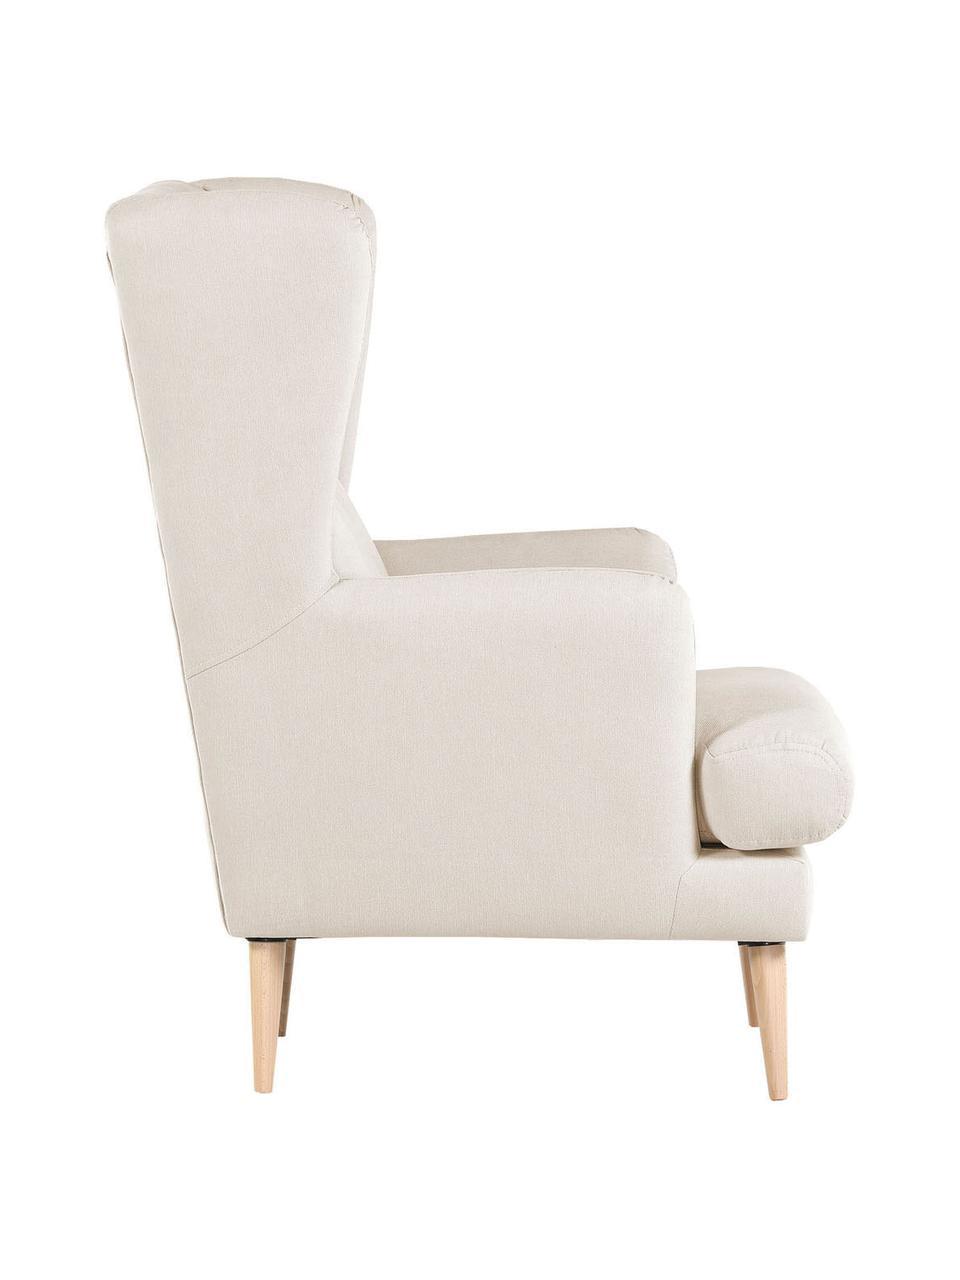 Fauteuil Robin in beige in scandi design, Bekleding: 90% polyester, 10% polyam, Poten: gelakt hout, Geweven stof beige, B 77 x D 85 cm